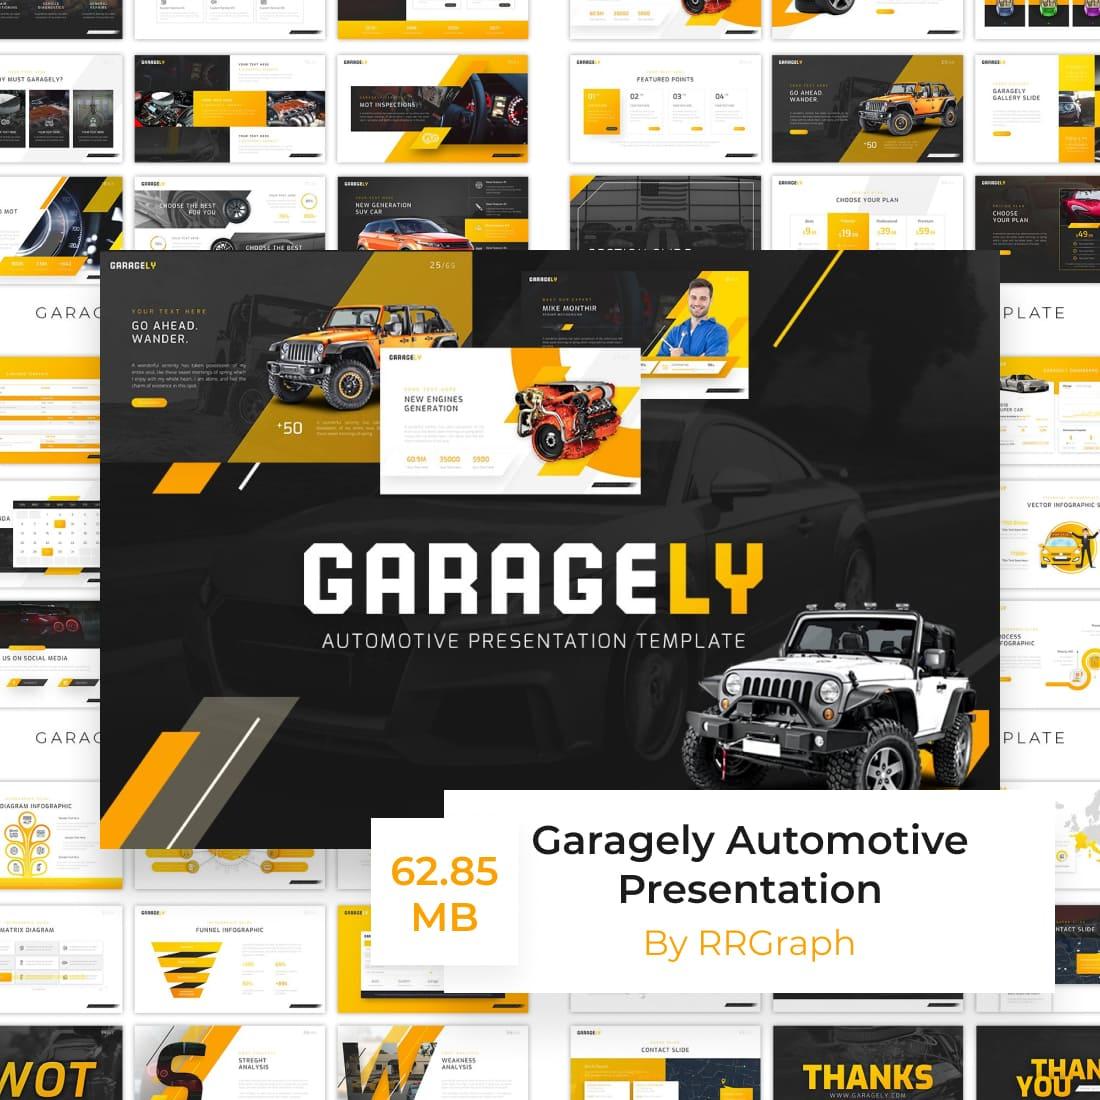 Garagely Automotive Presentation by MasterBundles.